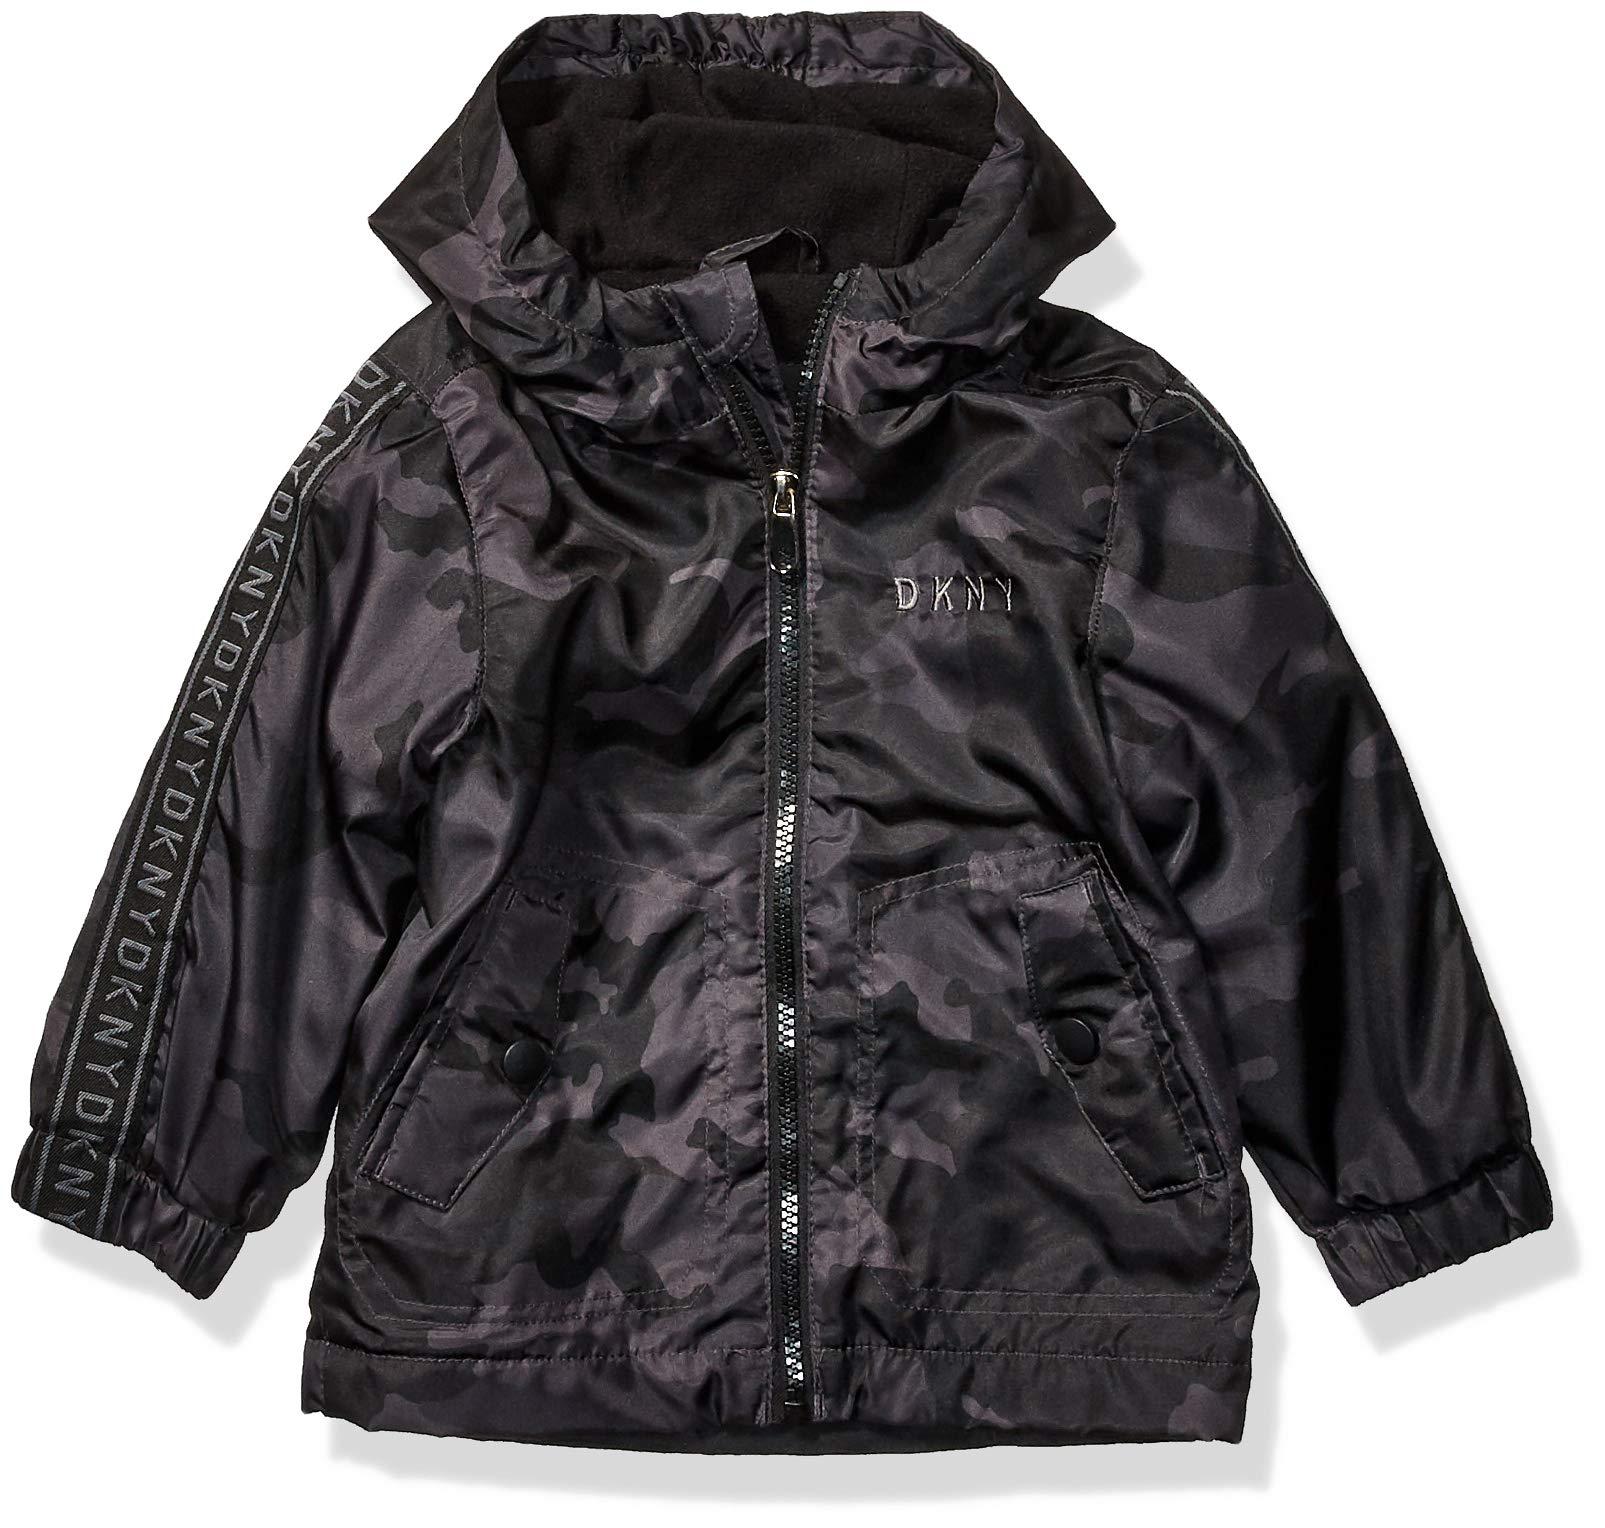 DKNY Baby Boys Fashion Outerwear Jacket, Logo Sleeves Black Camo, 18M by DKNY